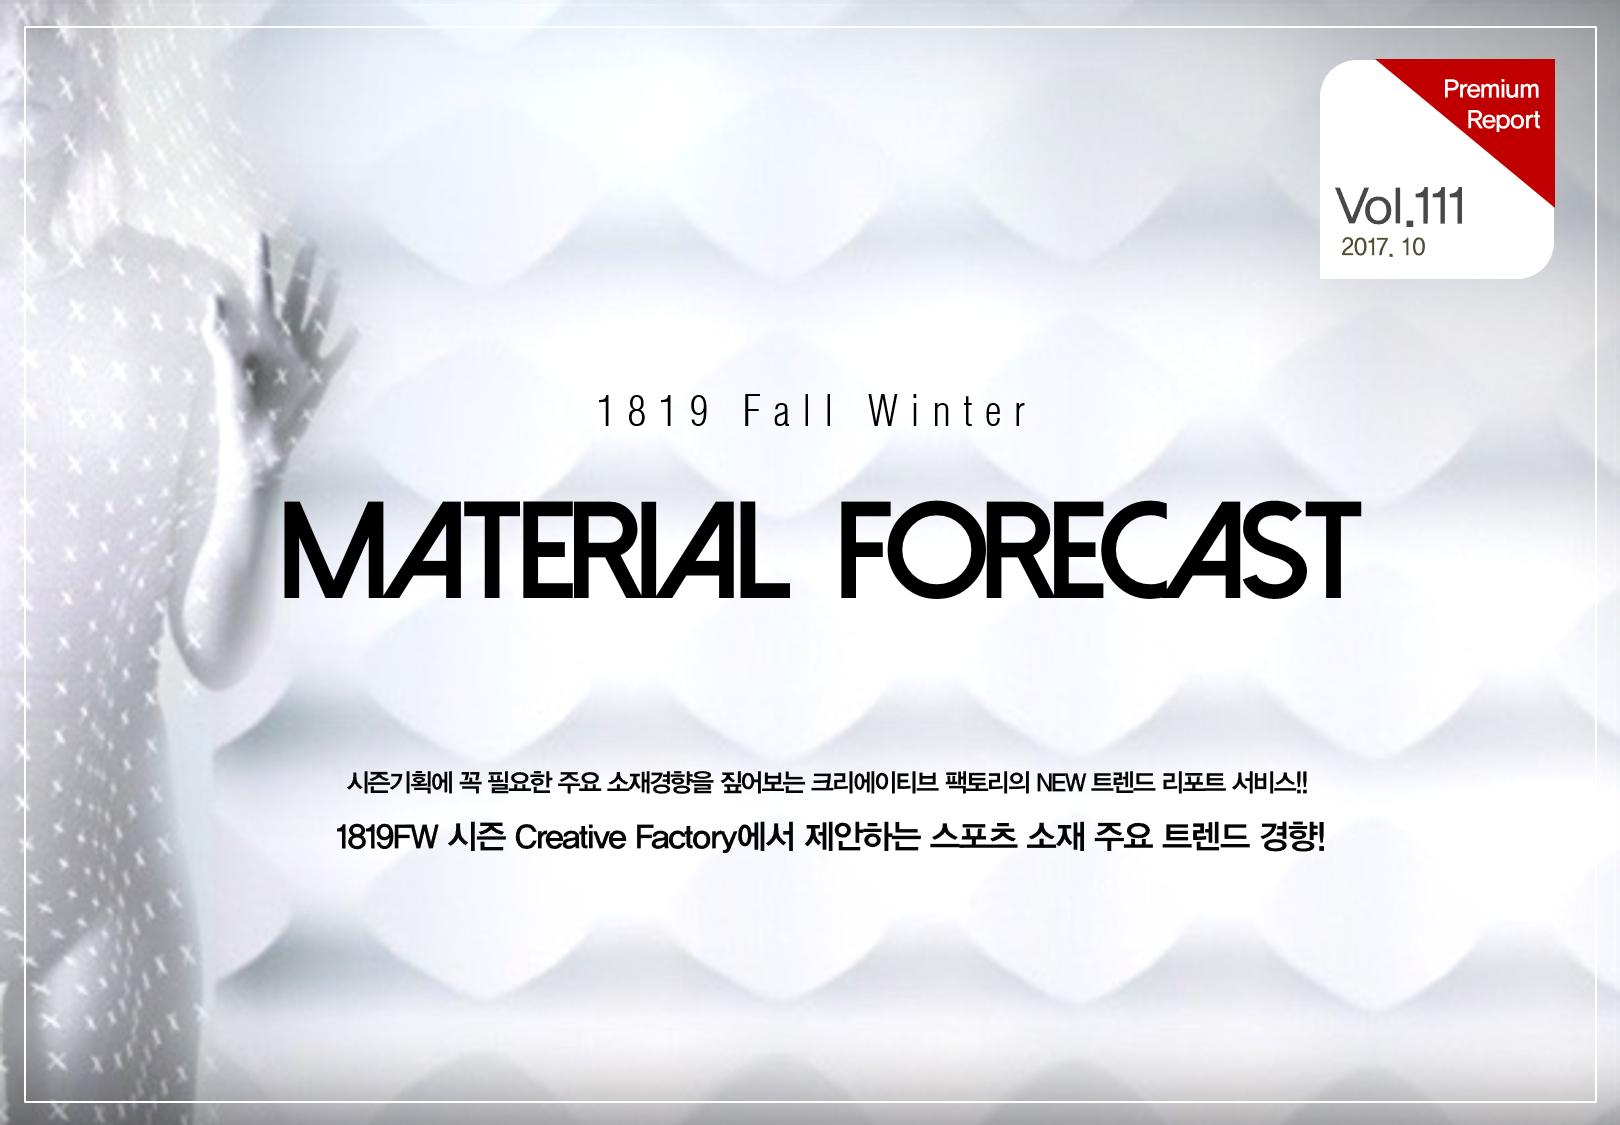 Material Forecast